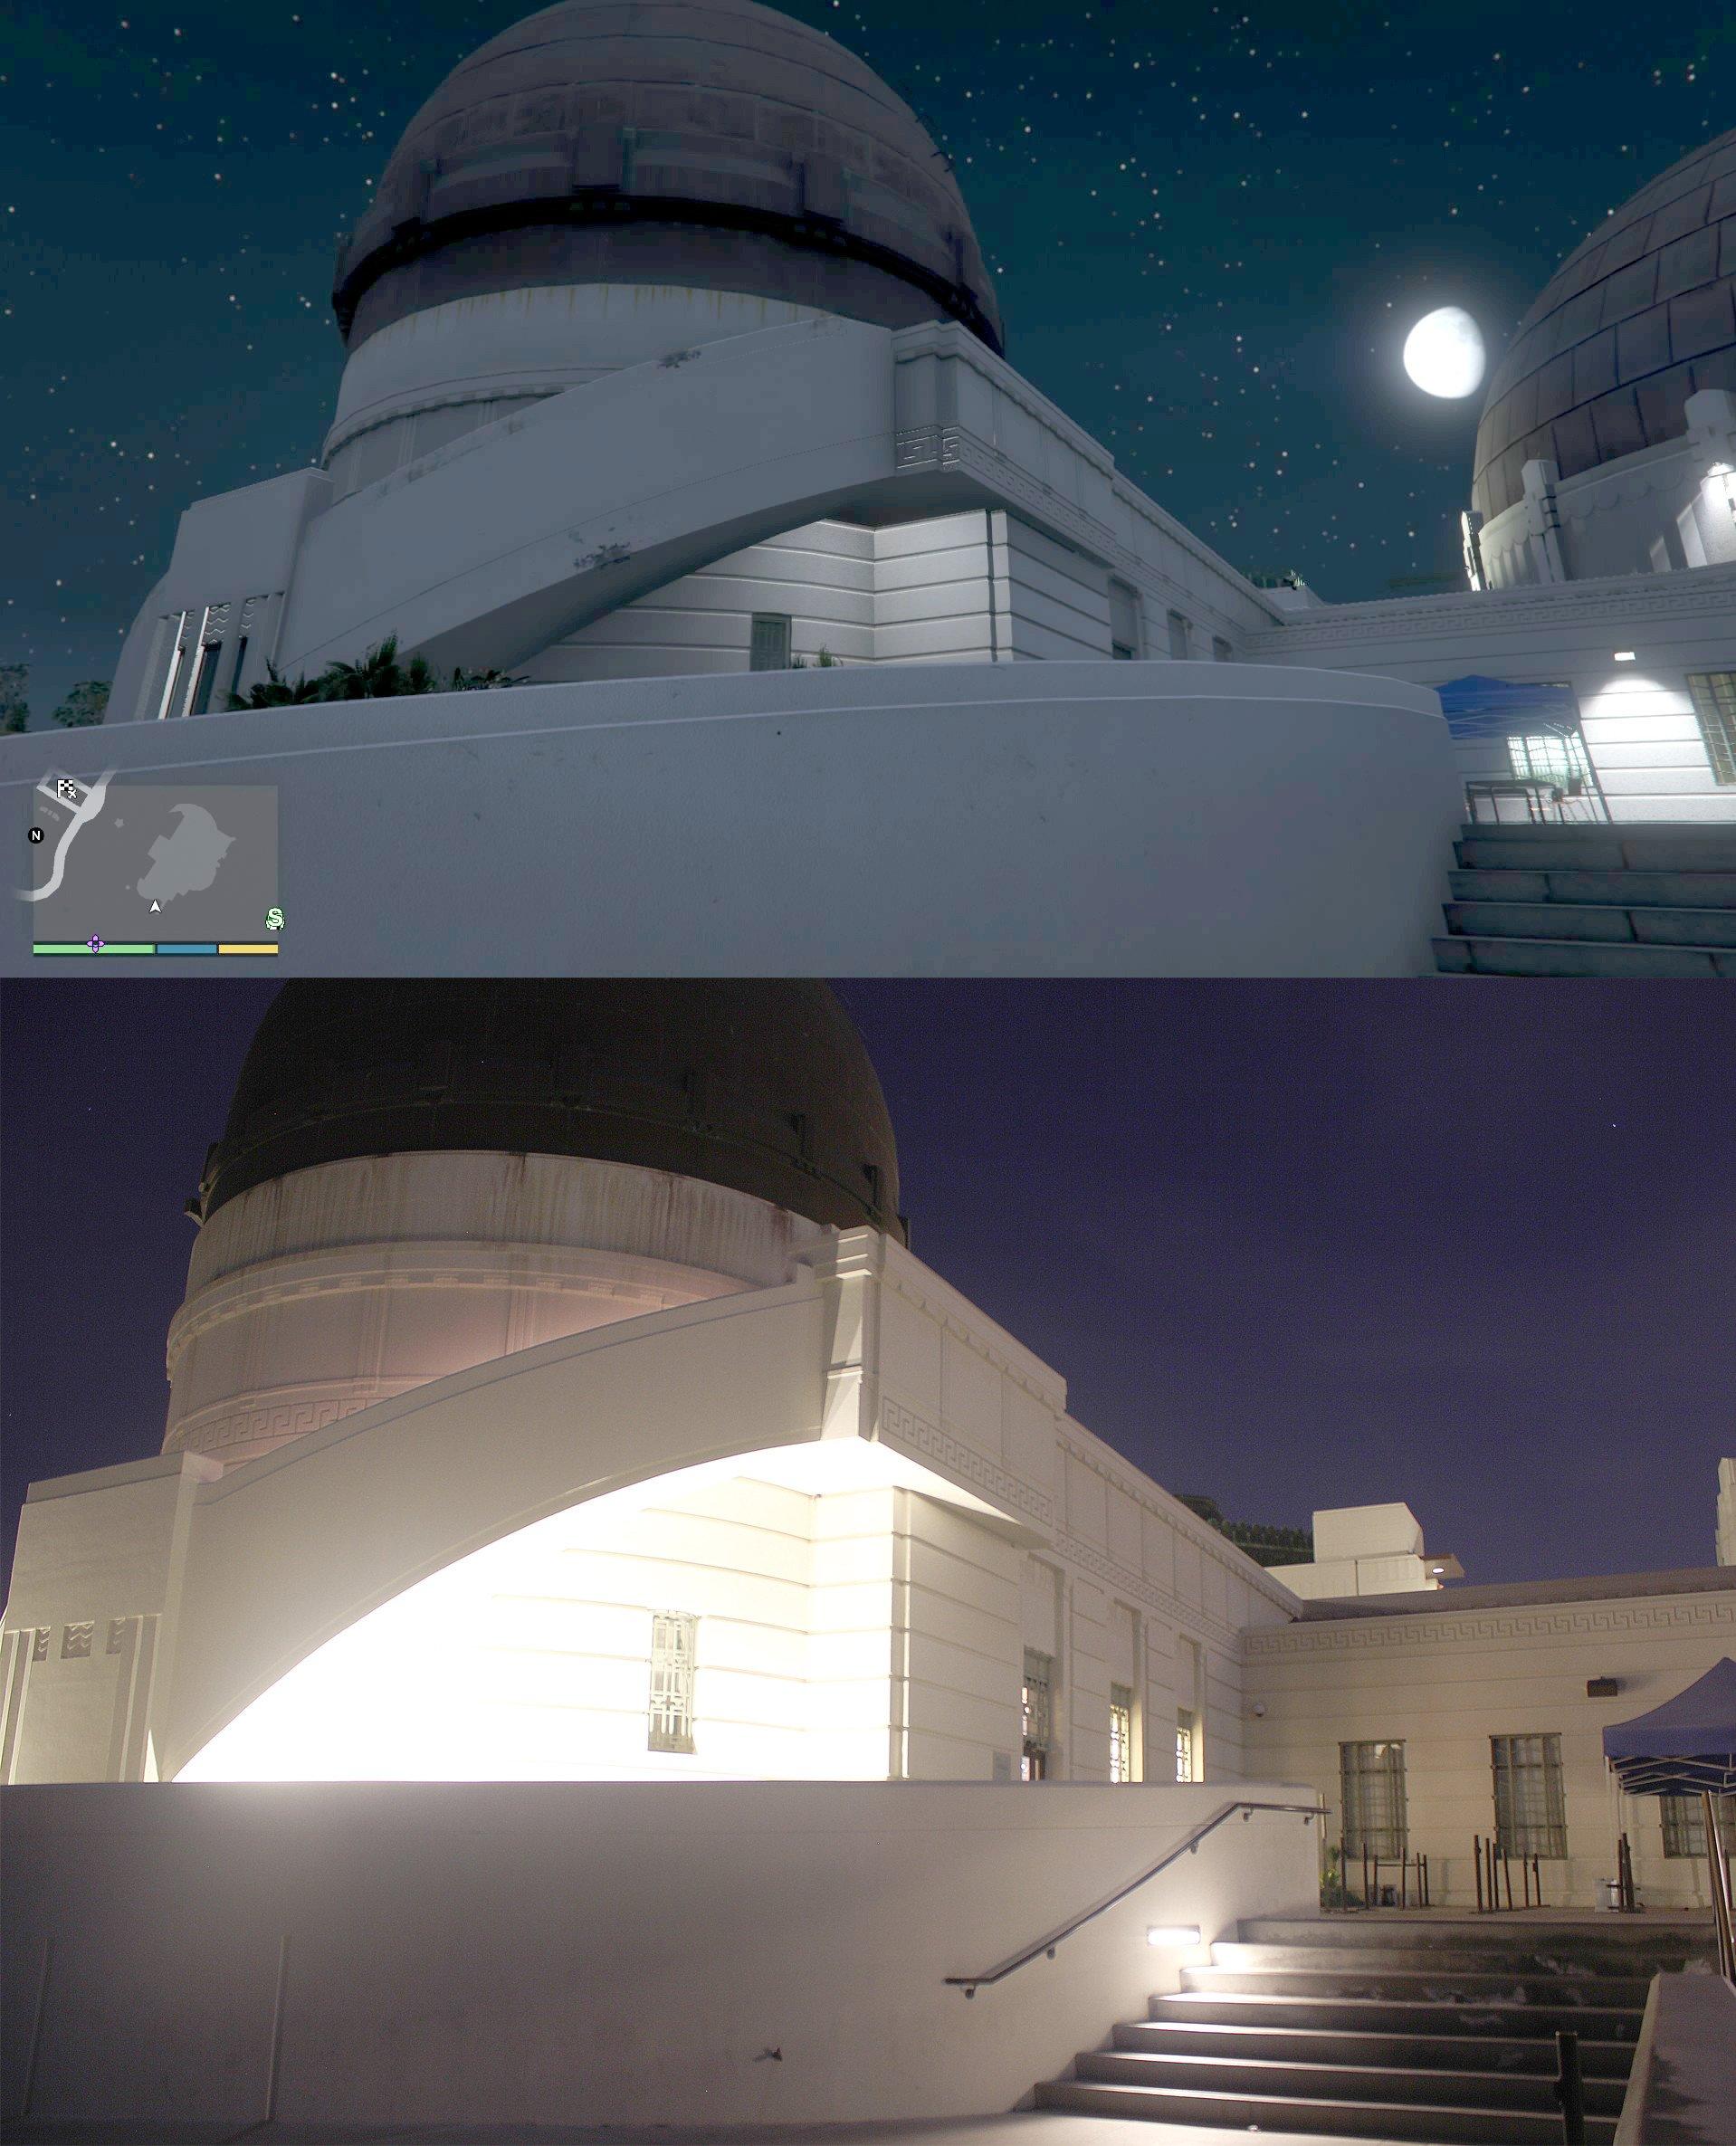 gta v los santos vs real life los angeles comparison screenshots  rockstar games nailed it with